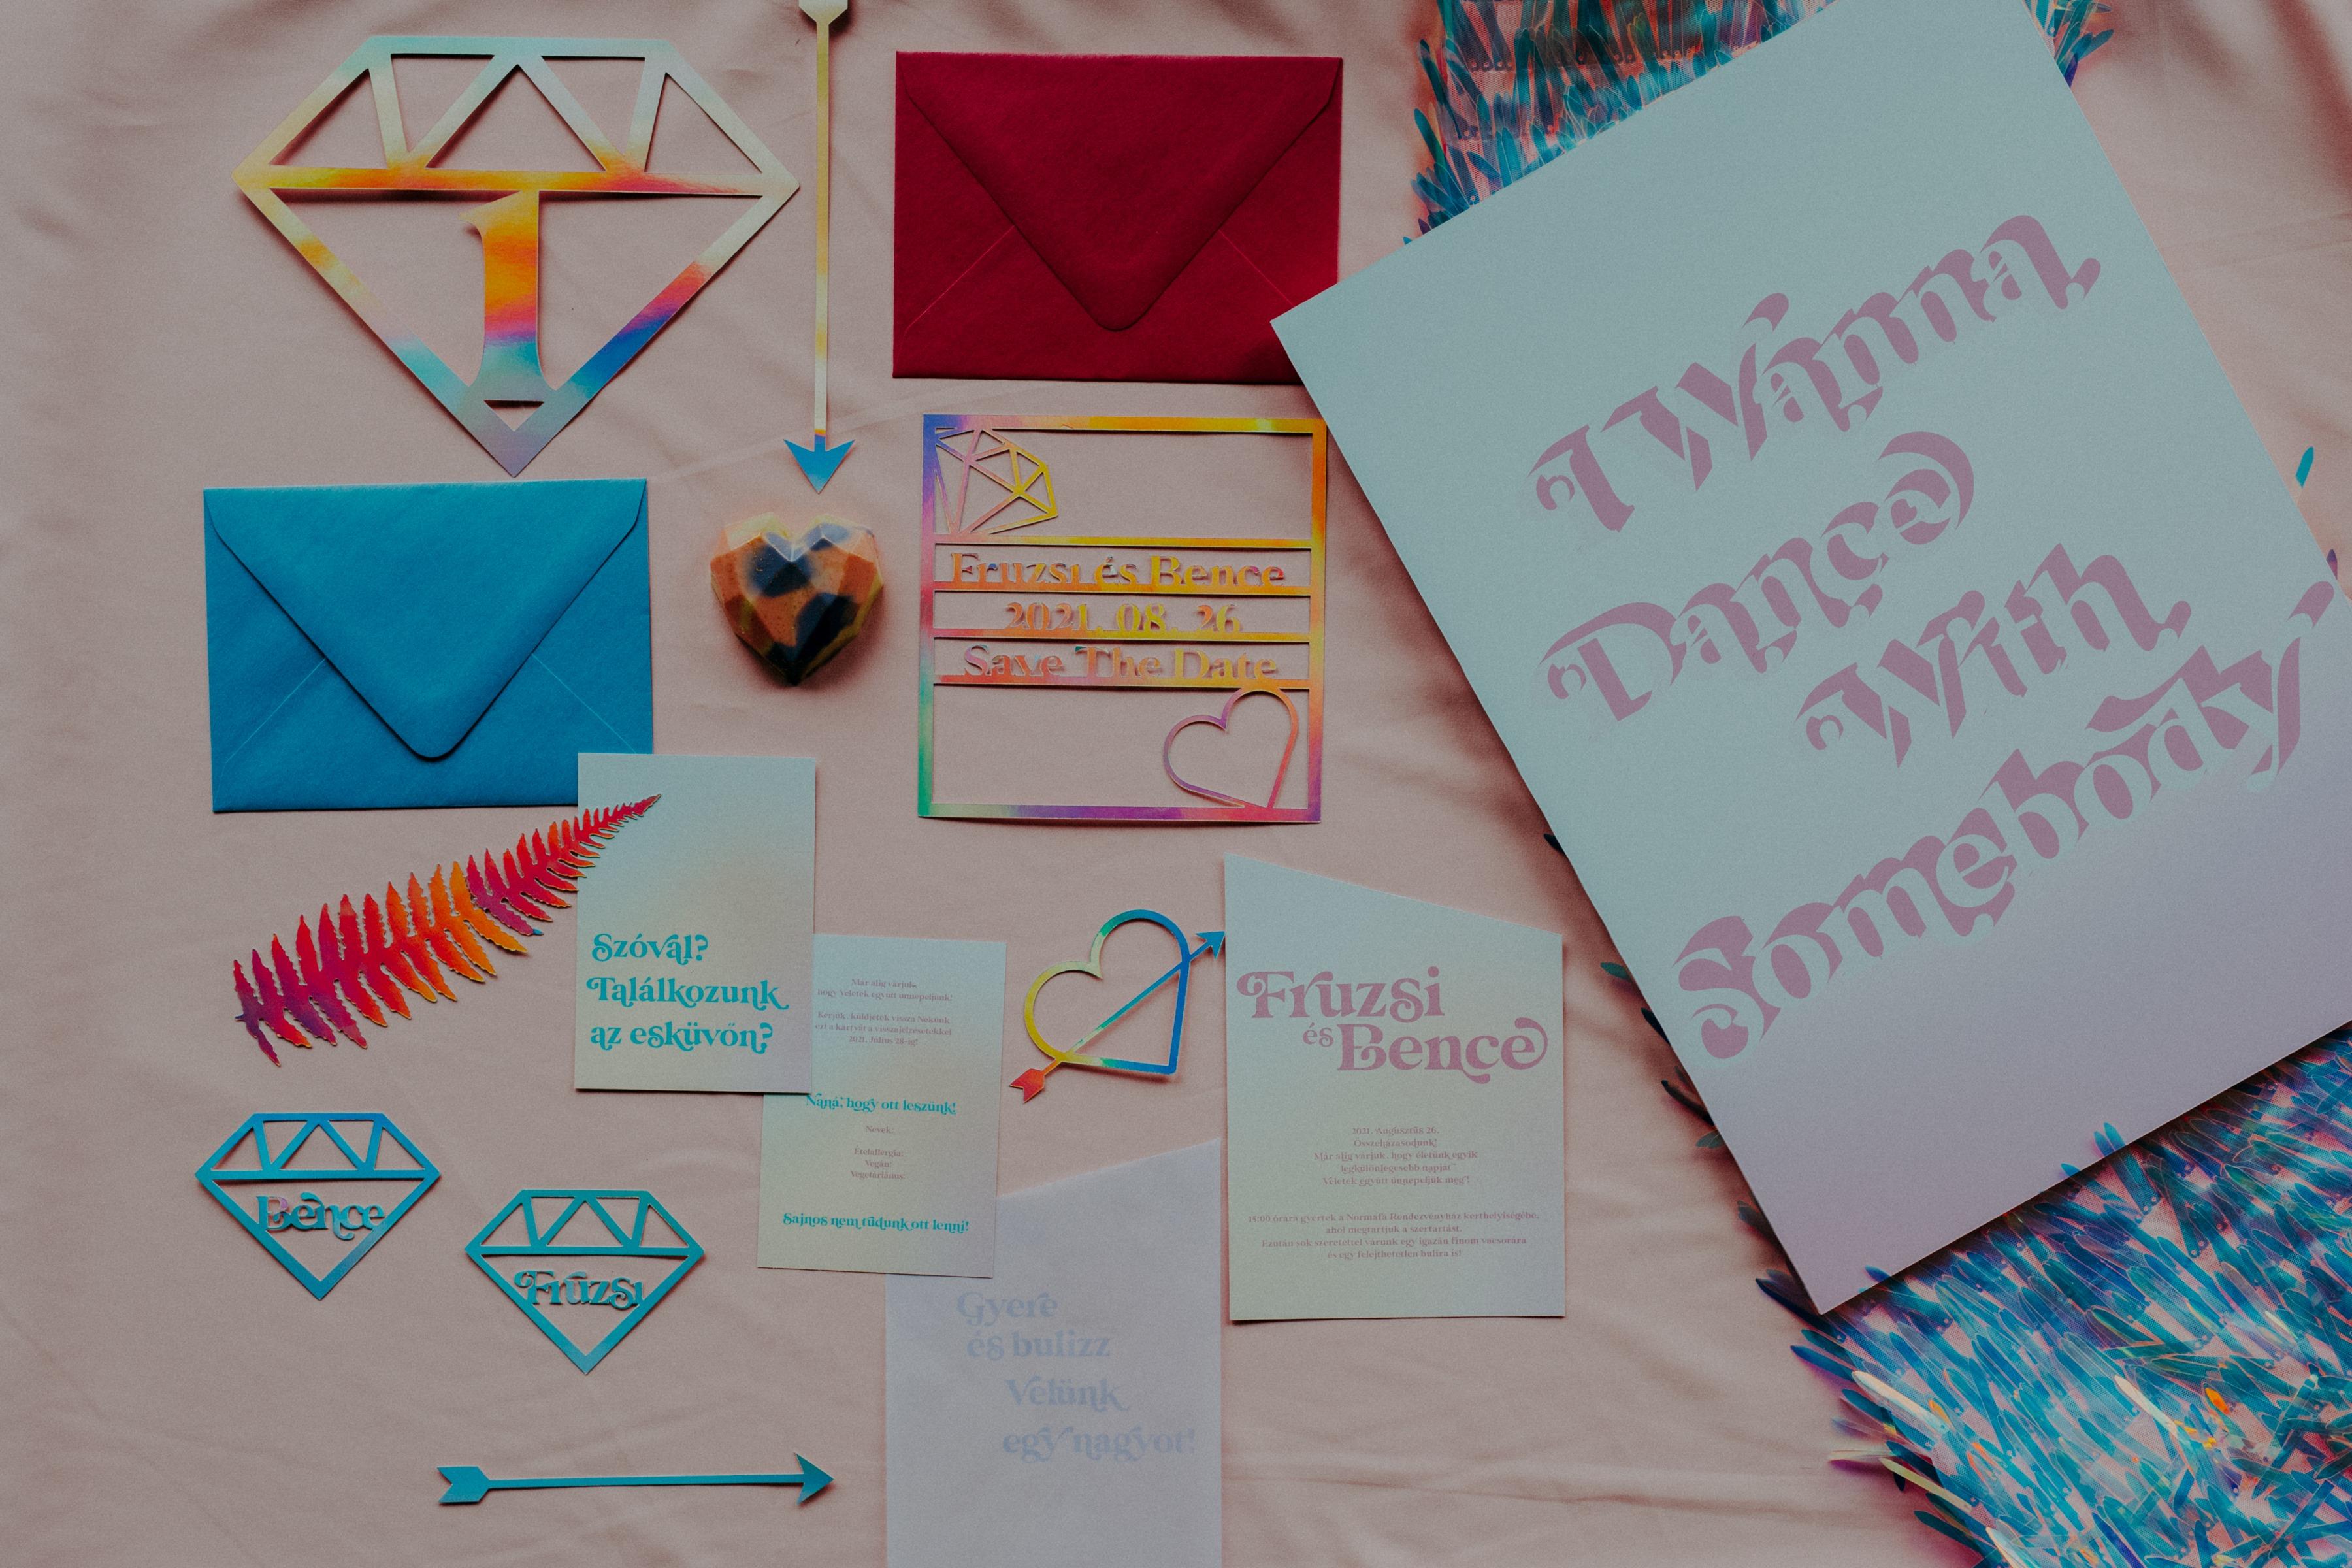 colourful pastel wedding - unconventional wedding - alternative wedding - unique wedding stationery - pastel wedding stationery - unique wedding invitations